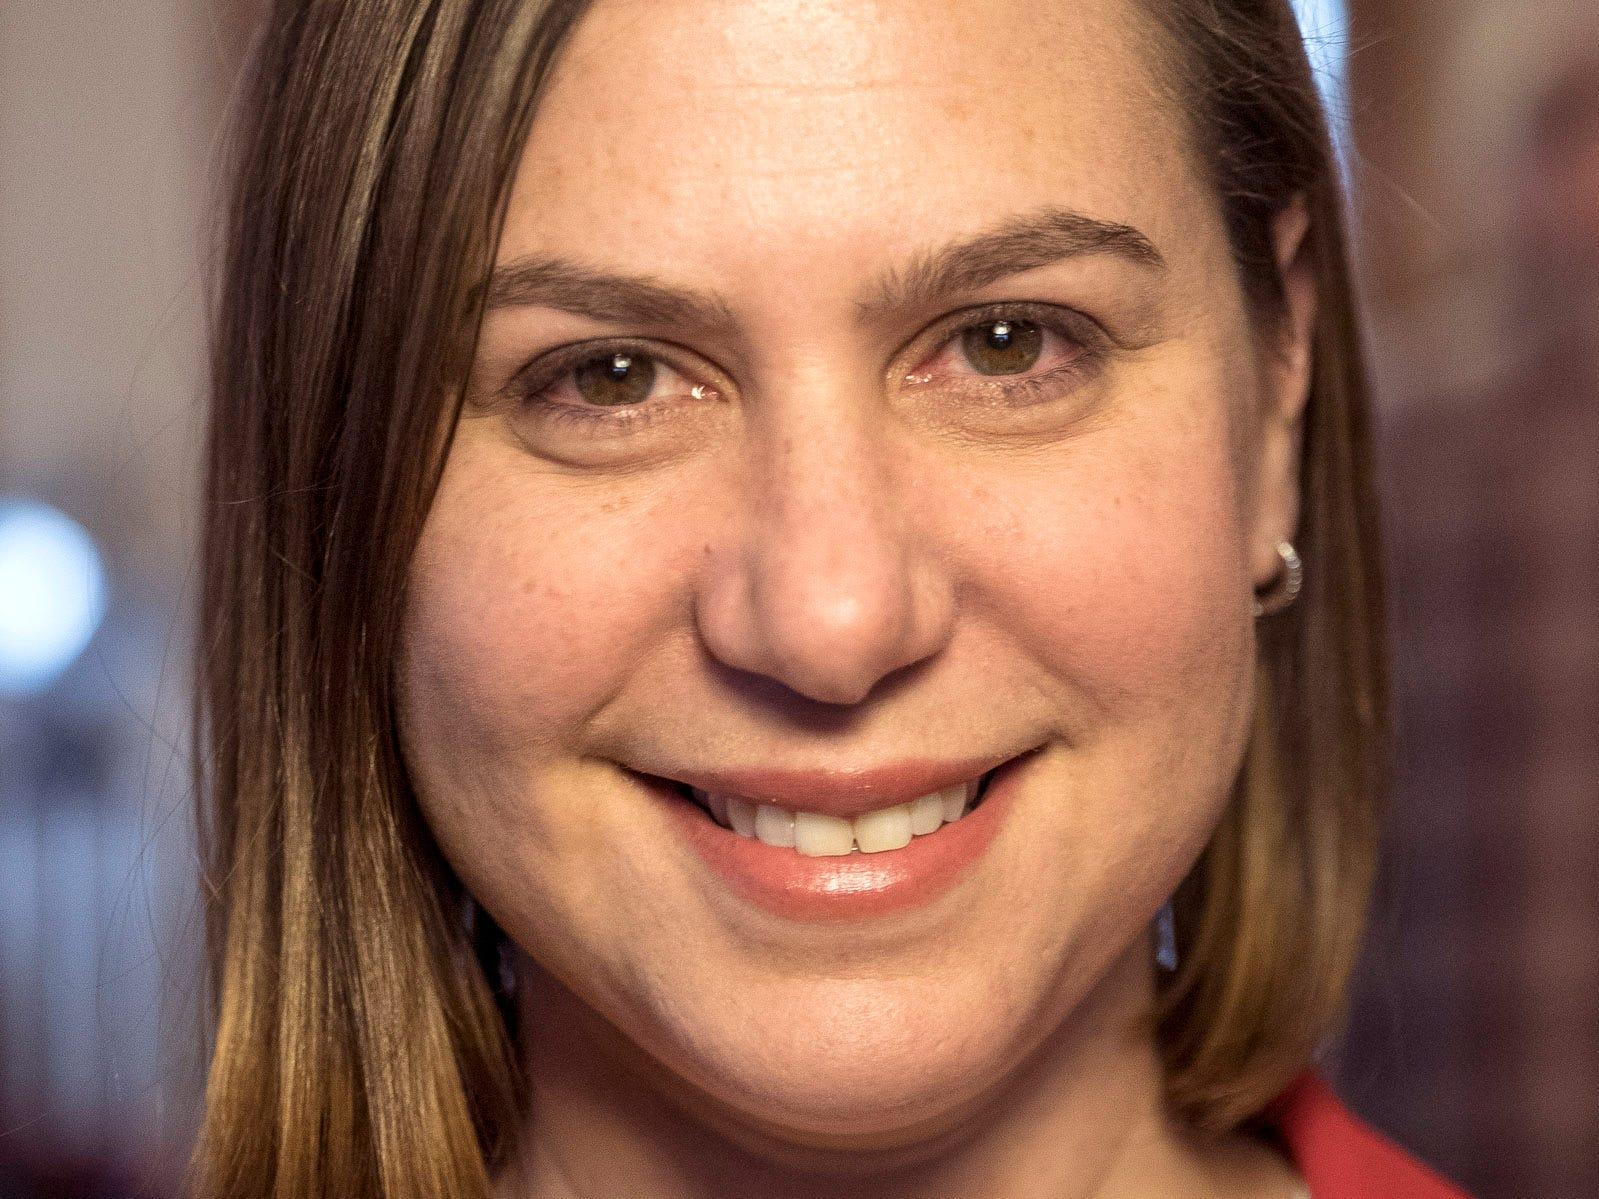 Rep. Elissa Slotkin: I'm donating my paycheck during shutdown